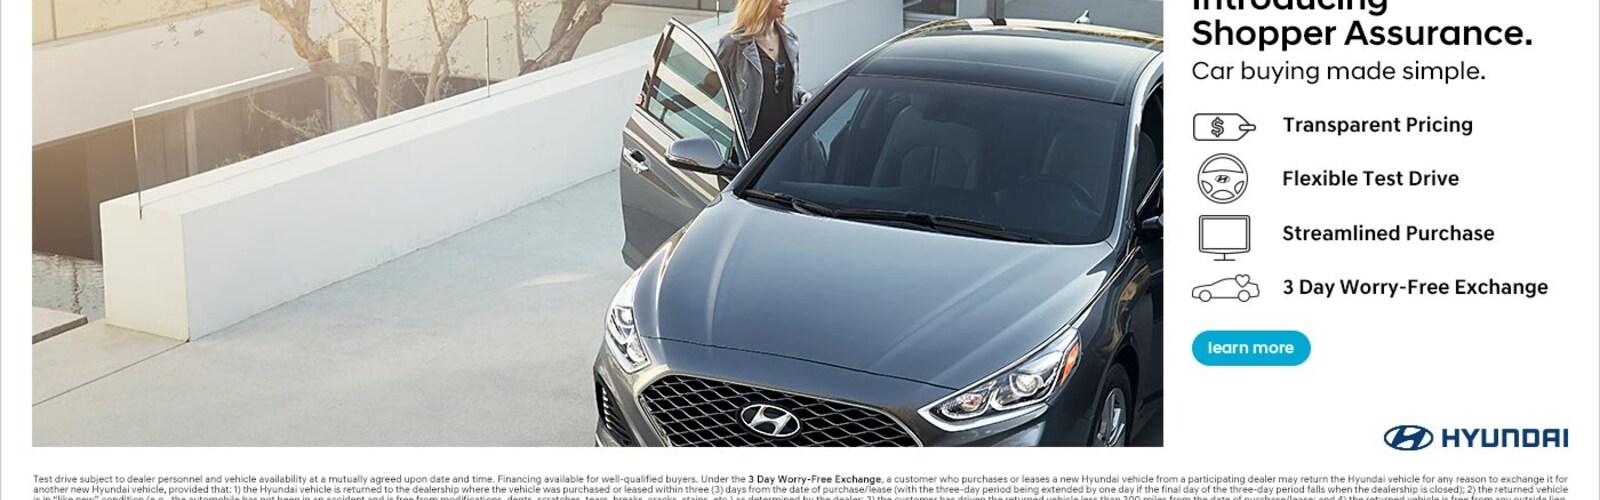 New and Used Hyundai dealership in Meriden   Meriden Hyundai